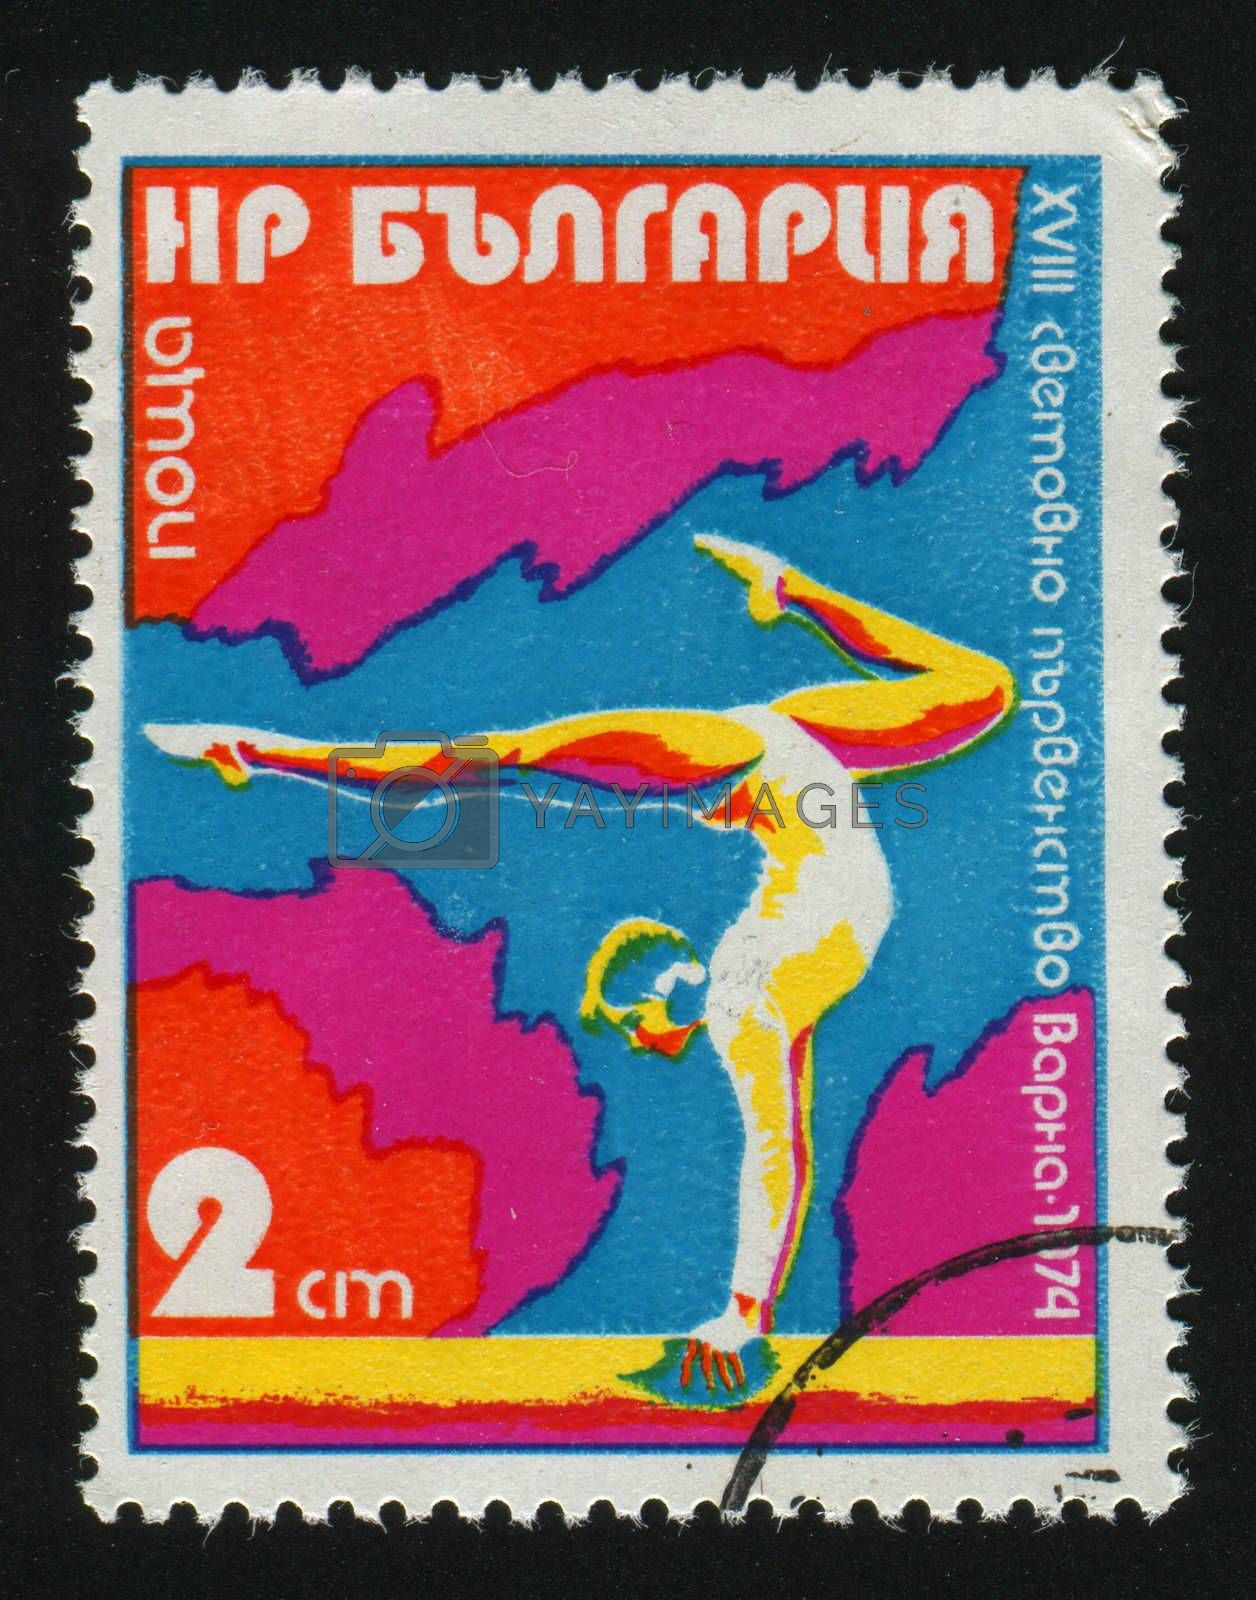 BULGARIA - CIRCA 1974: Gymnast on Parallel Bars, circa 1974.